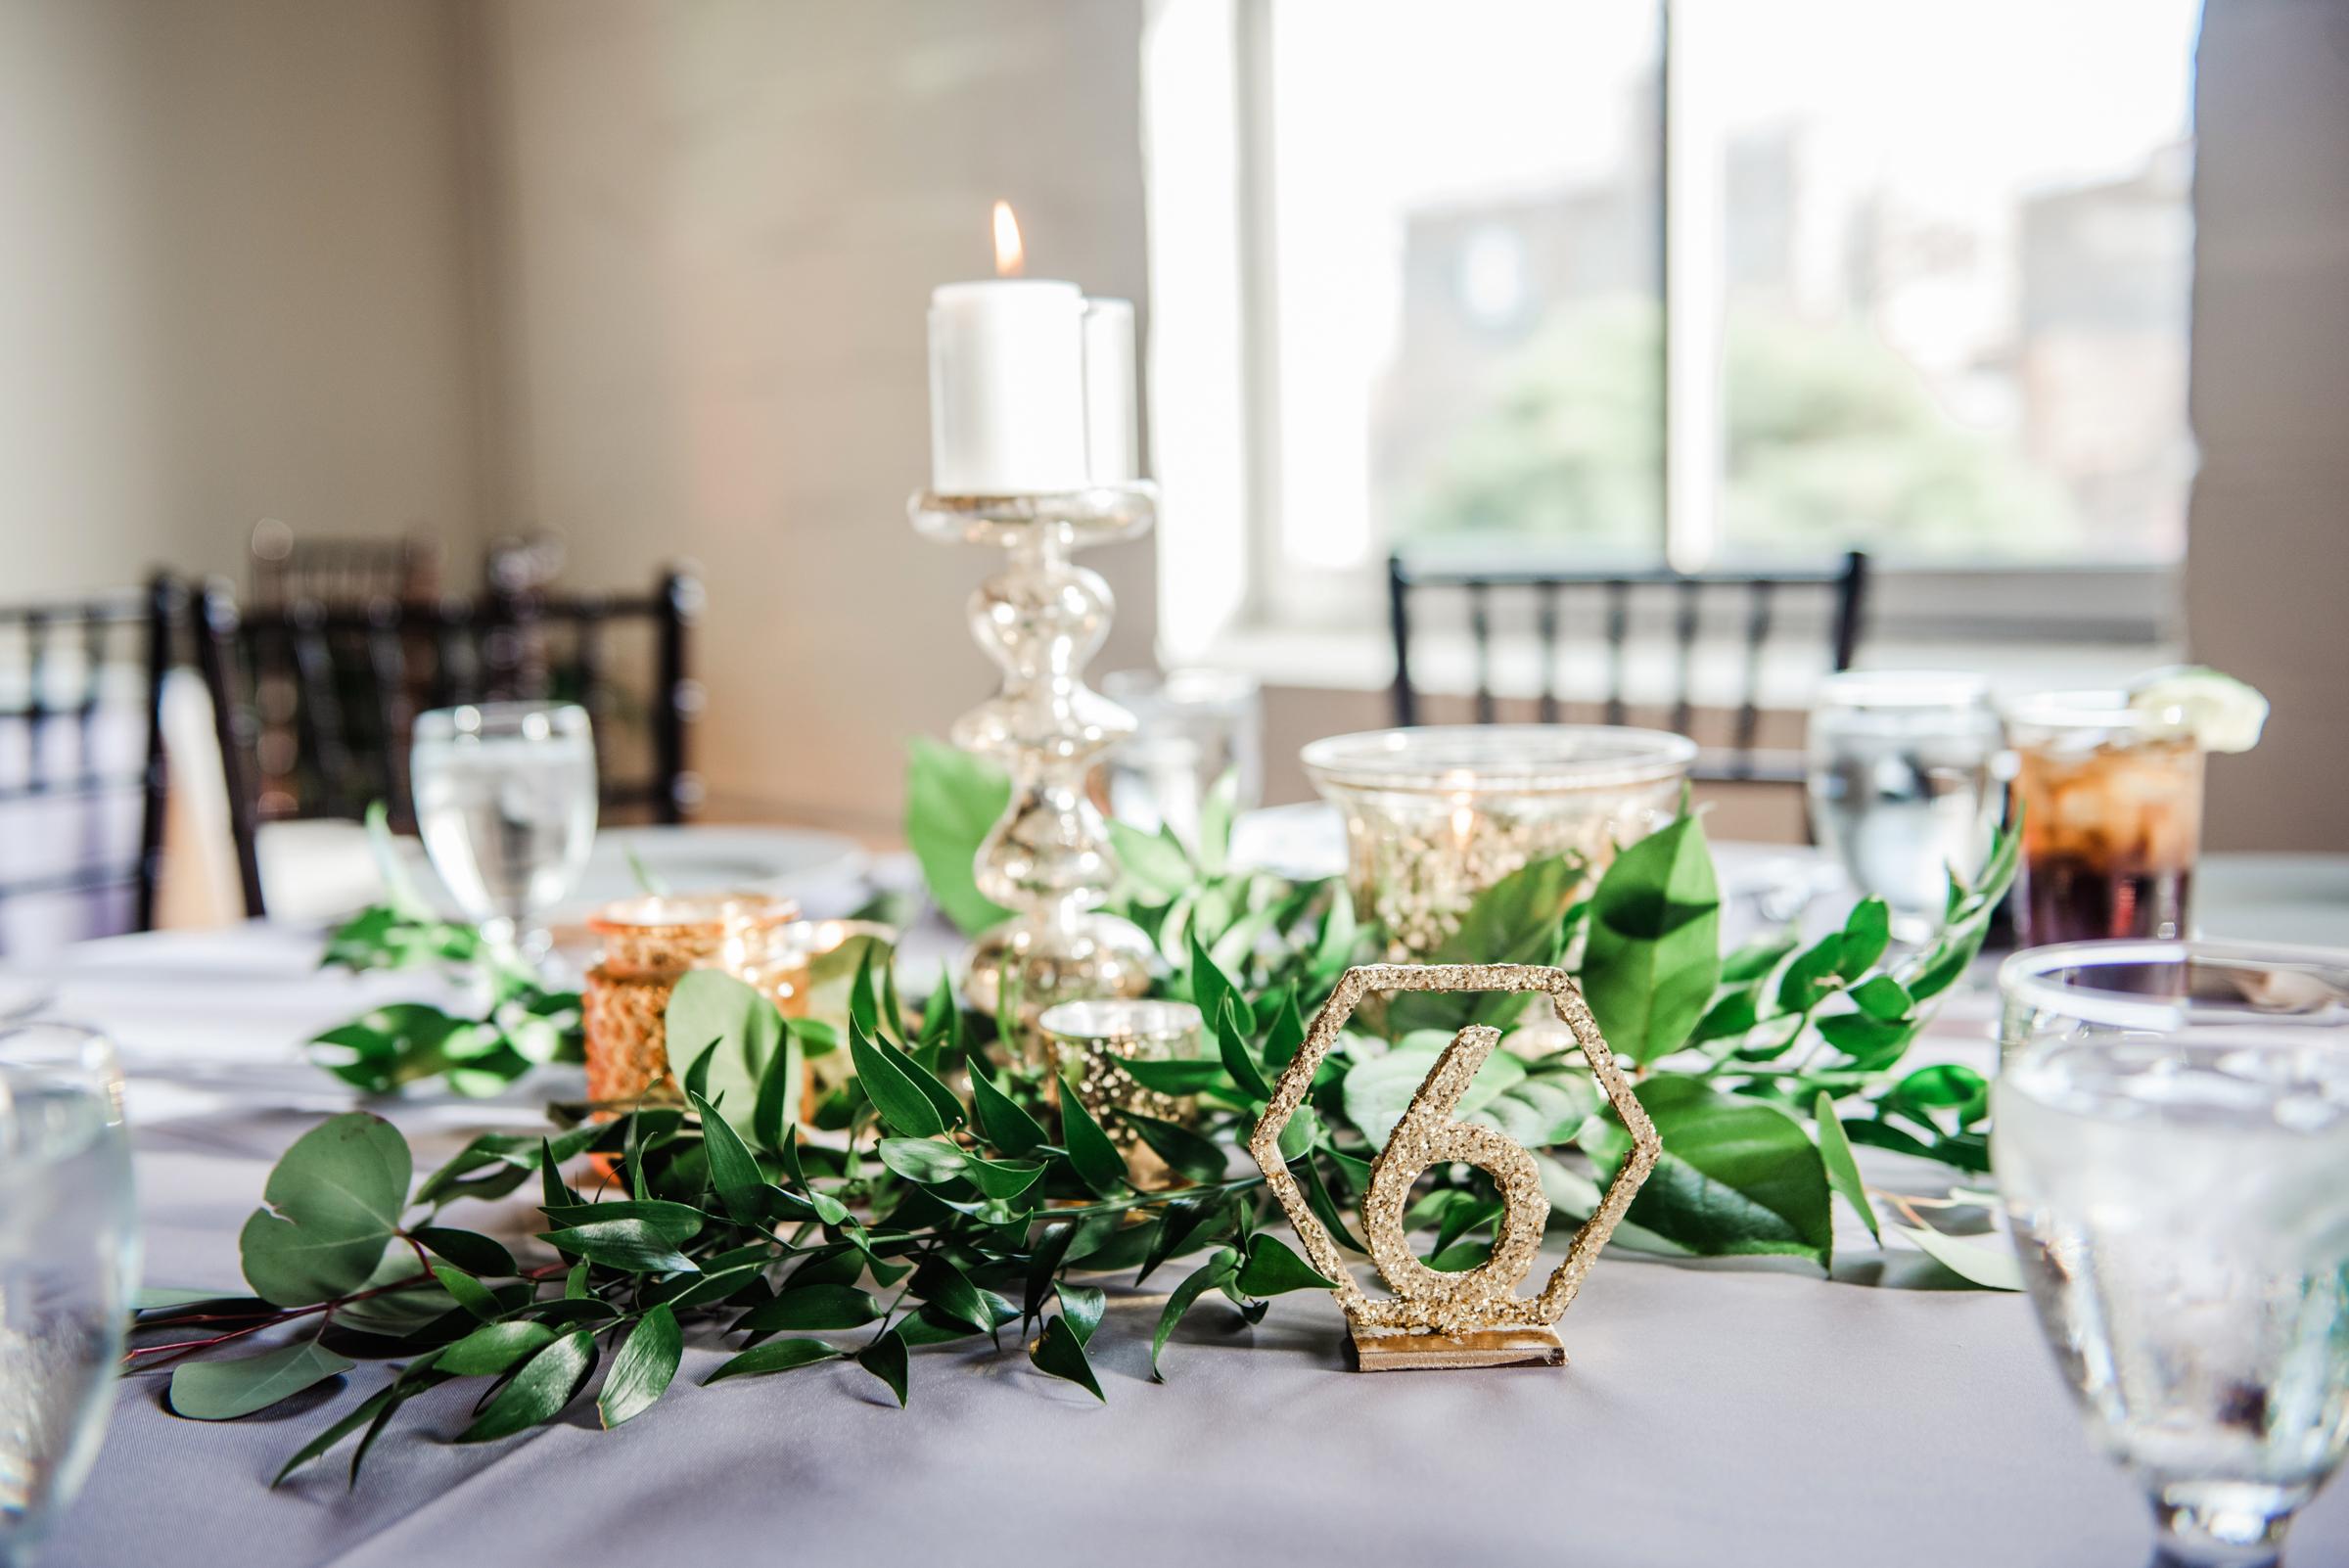 The_Arbor_LoftRochester_Wedding_JILL_STUDIO_Rochester_NY_Photographer_174005.jpg